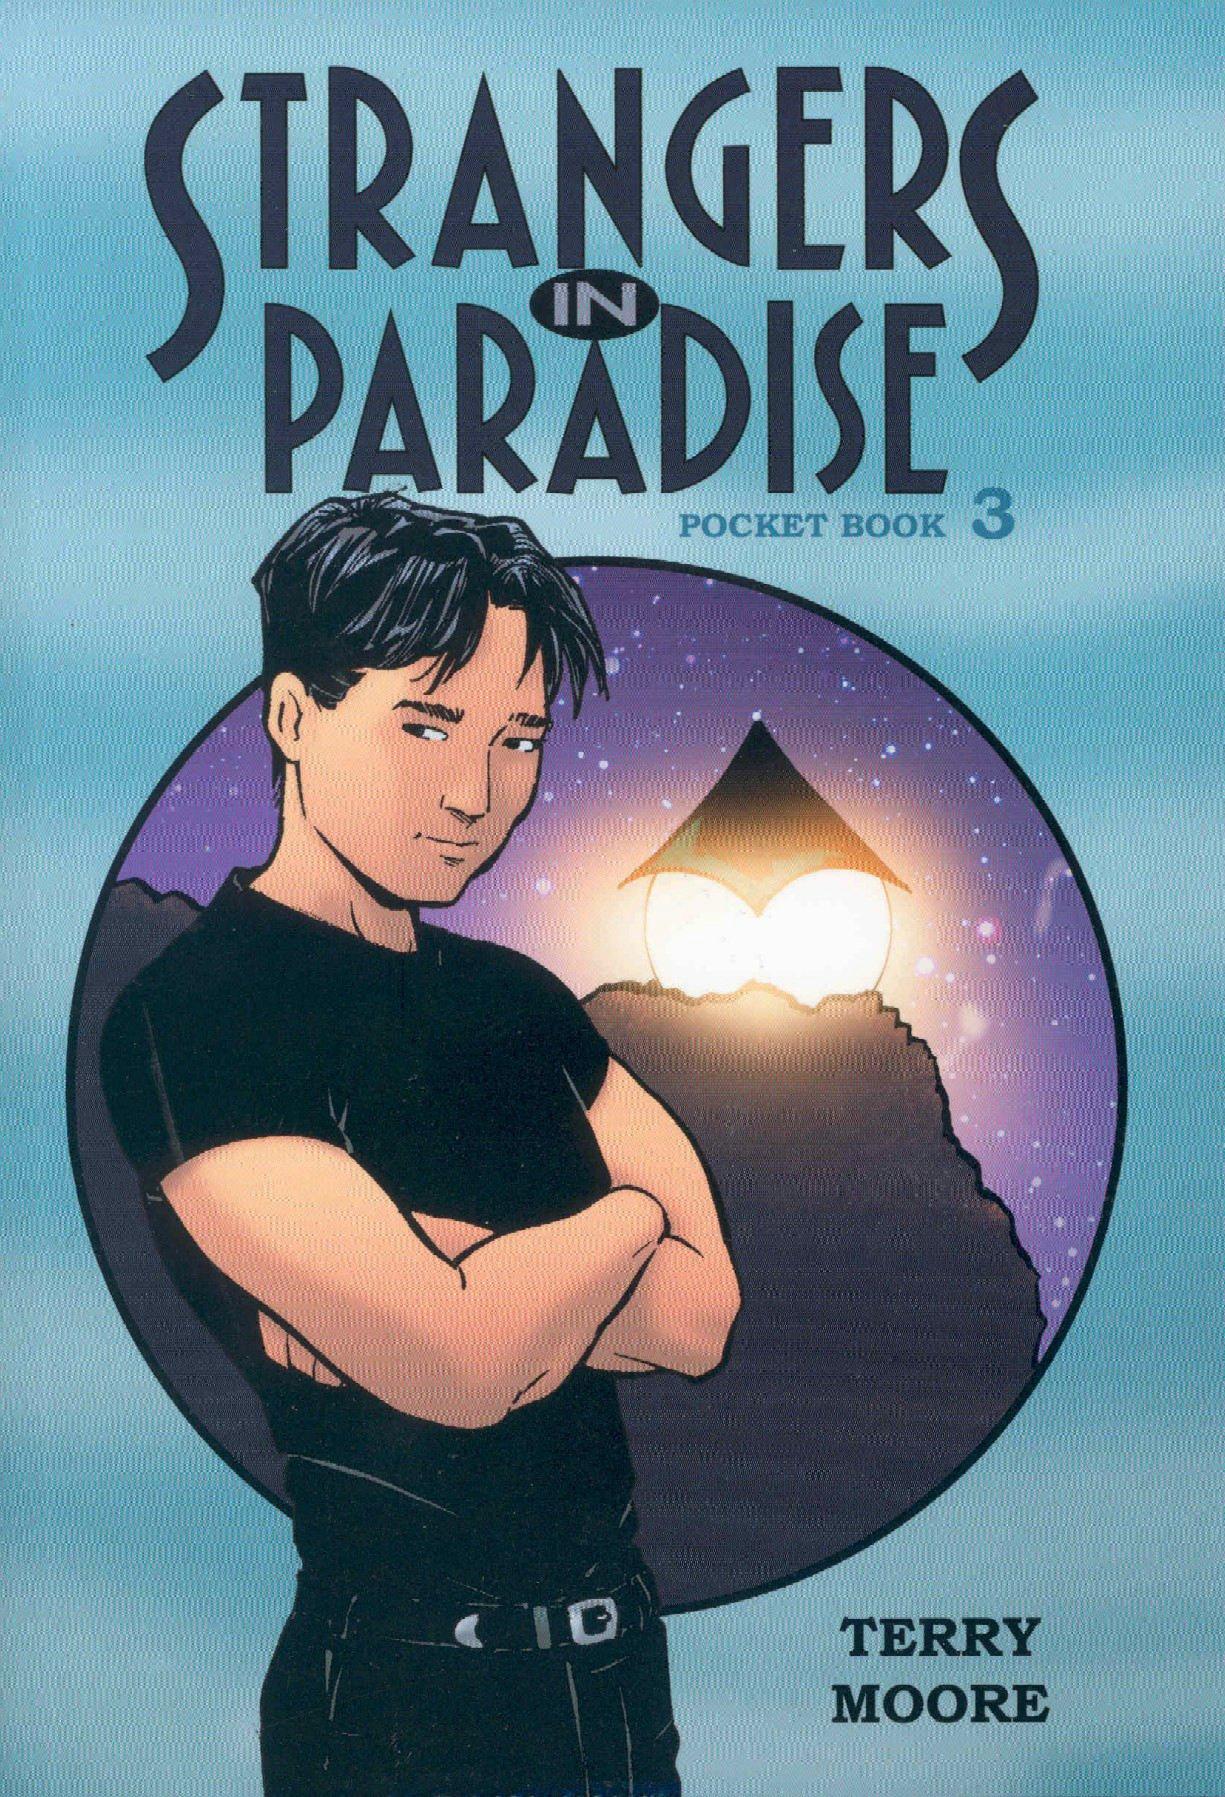 Strangers In Paradise Pocket Book 3 (Strangers in Paradise (Graphic Novels))